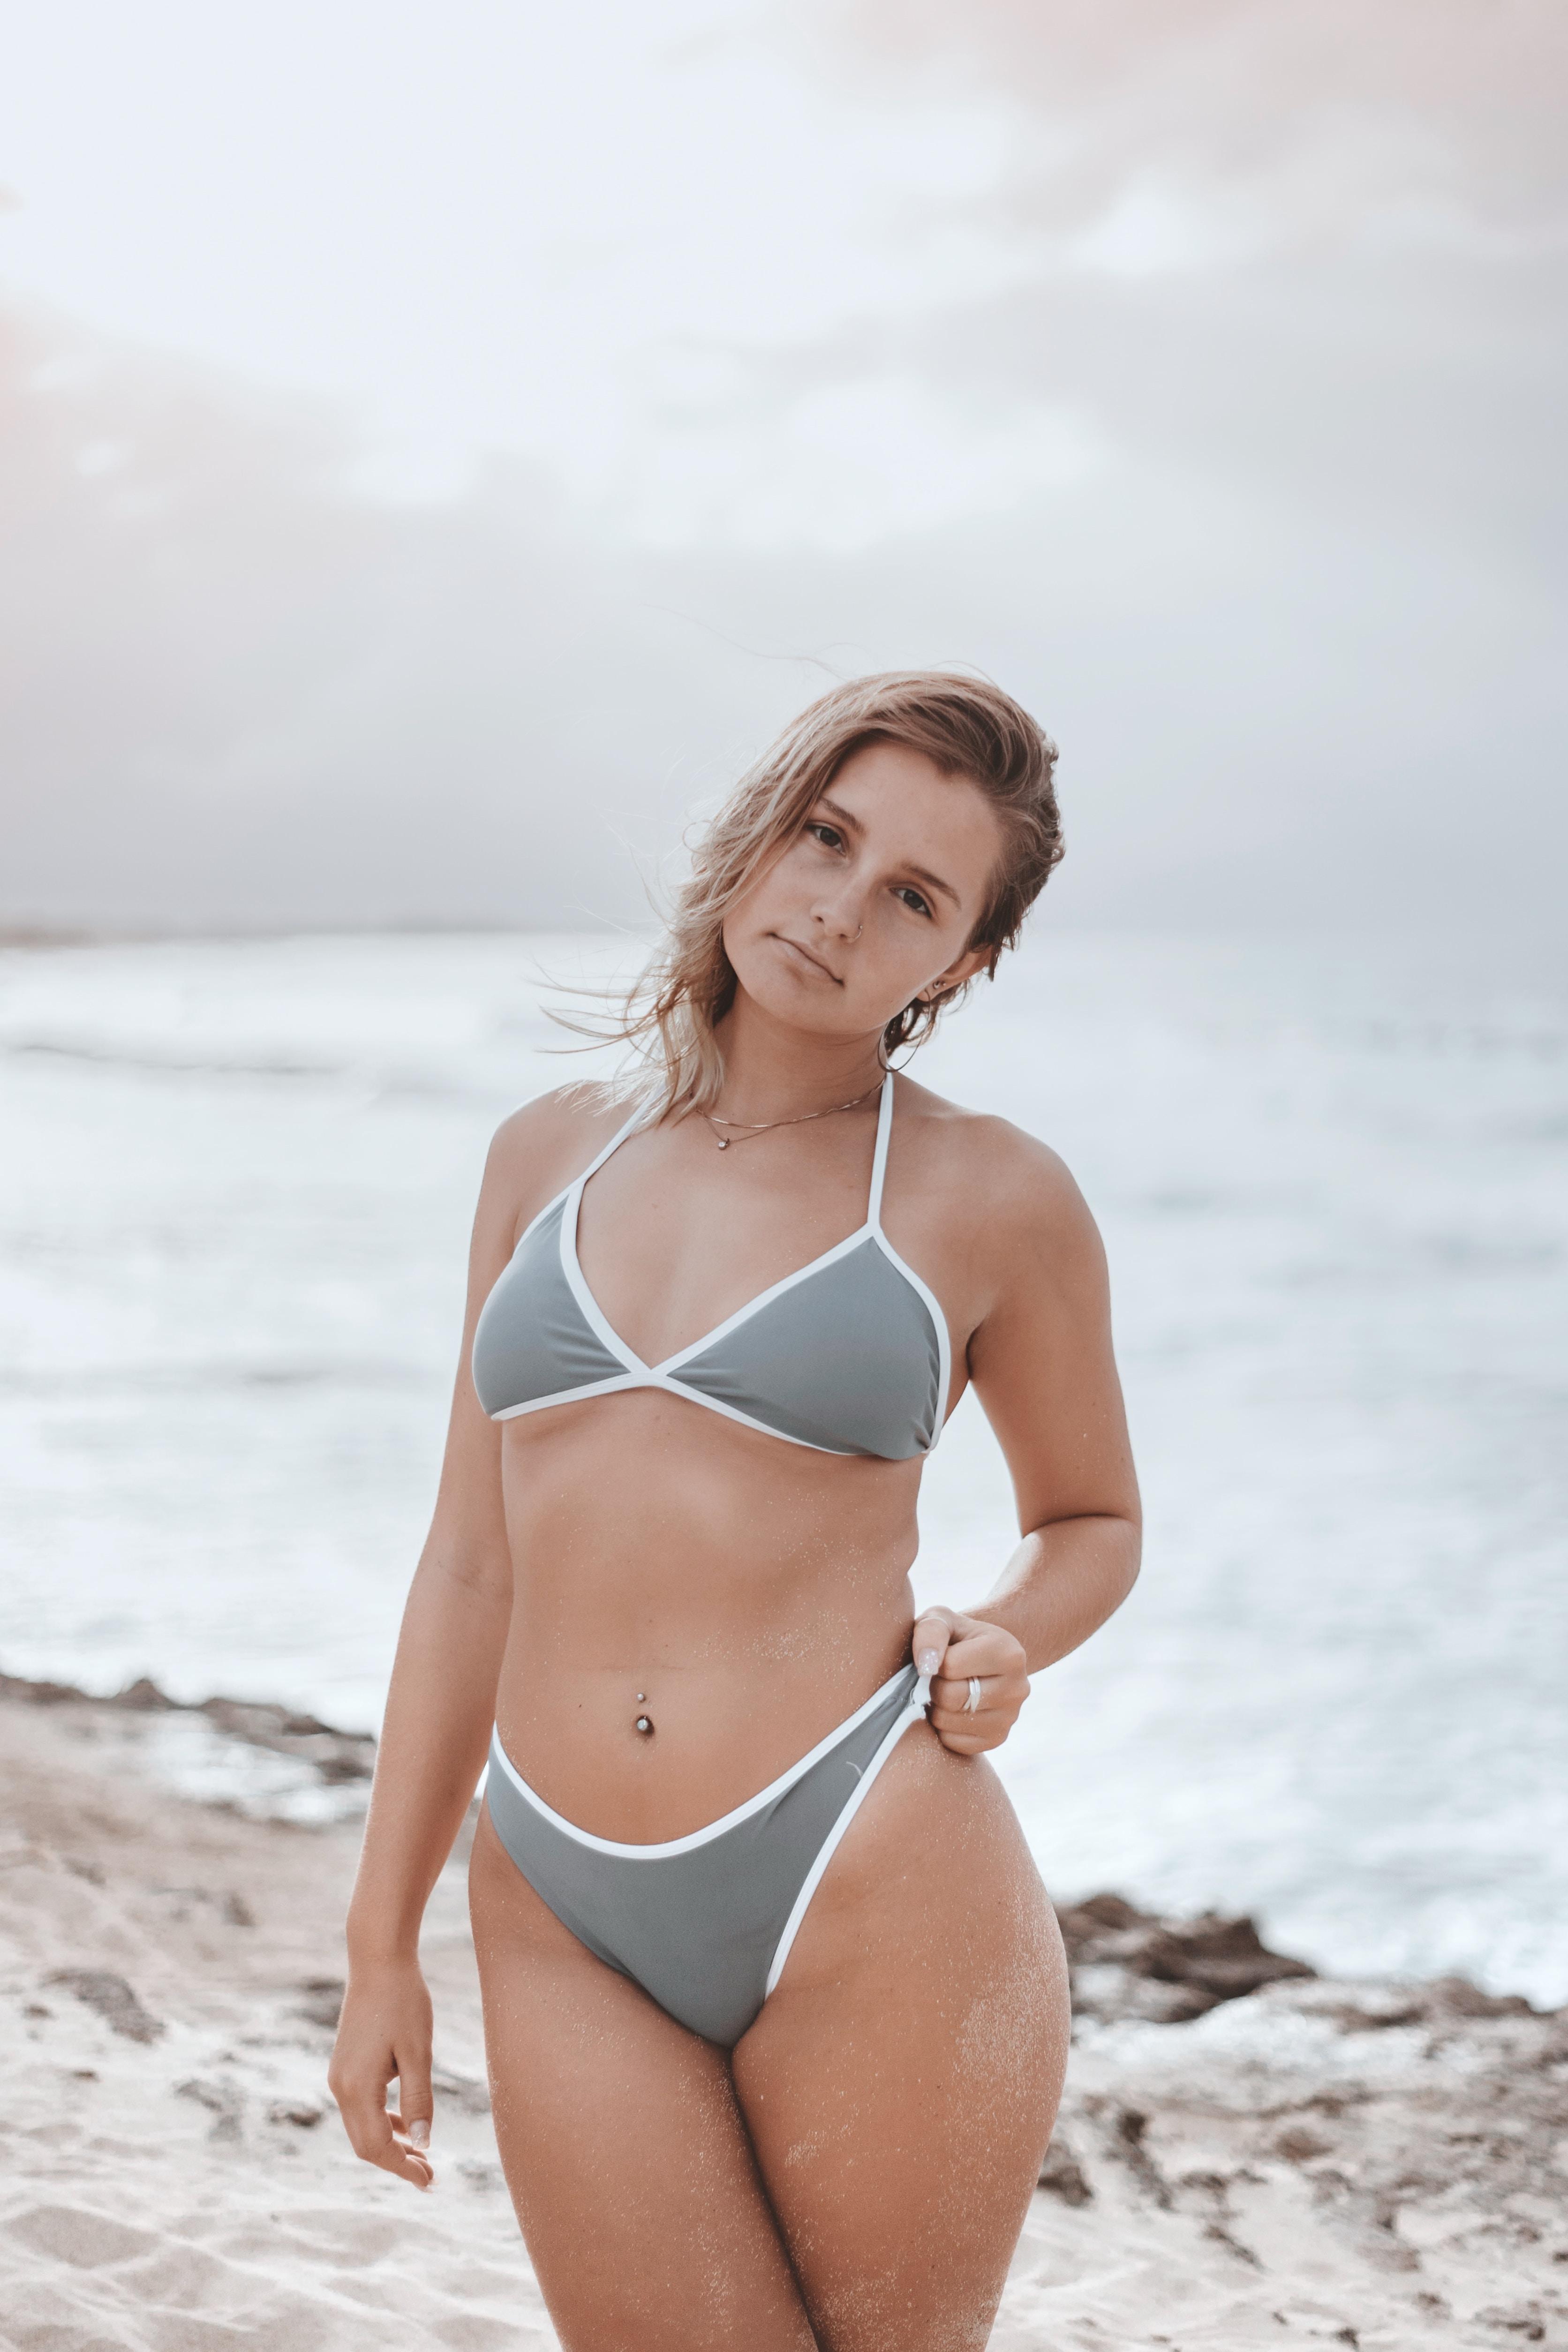 Skimpy bikini wallpaper